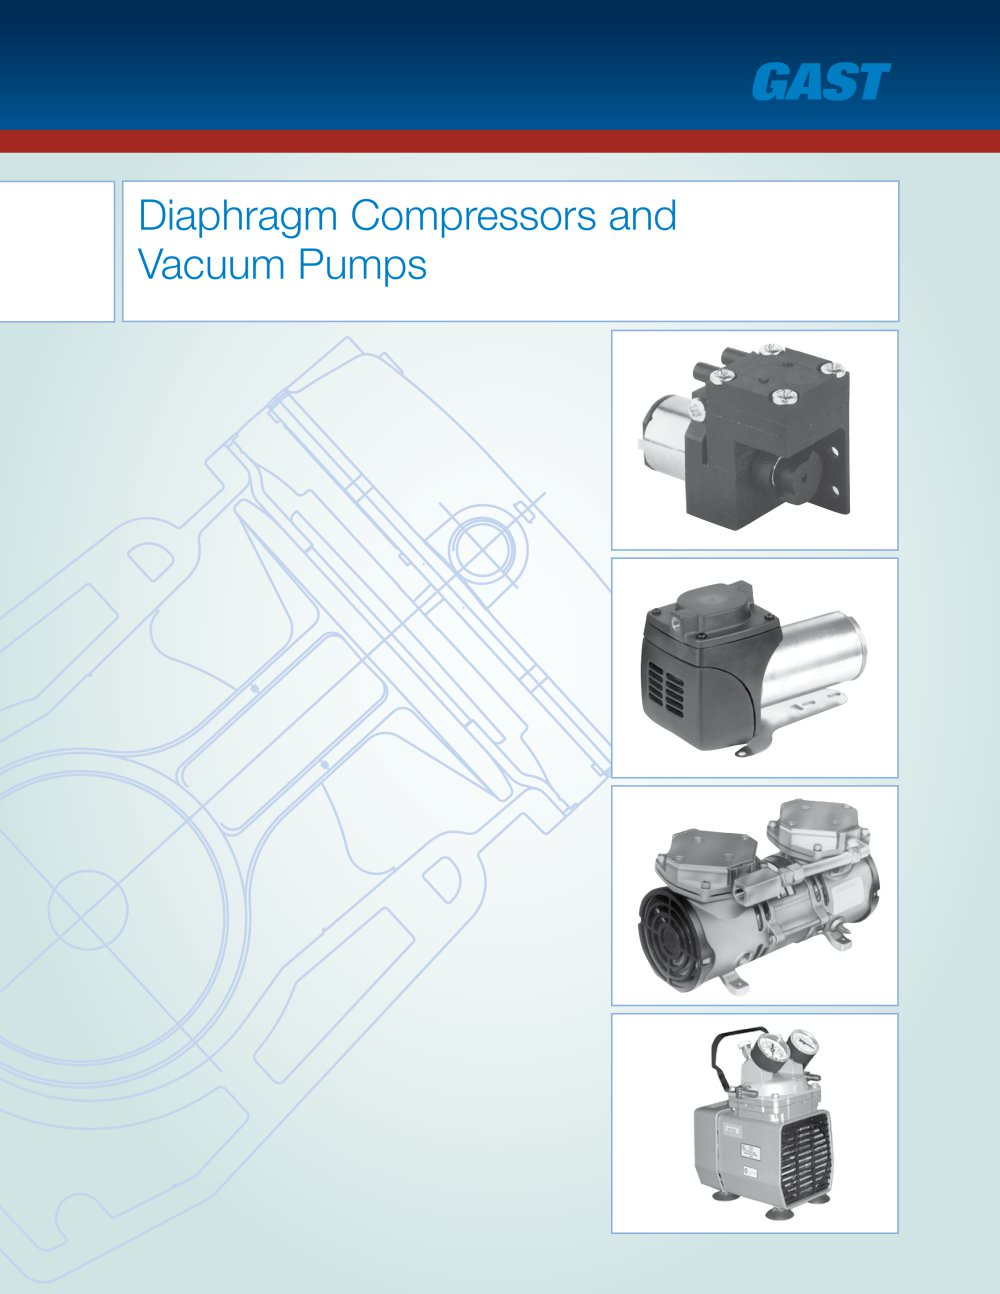 Diaphragm Compressors and Vacuum Pumps - 1 / 37 Pages